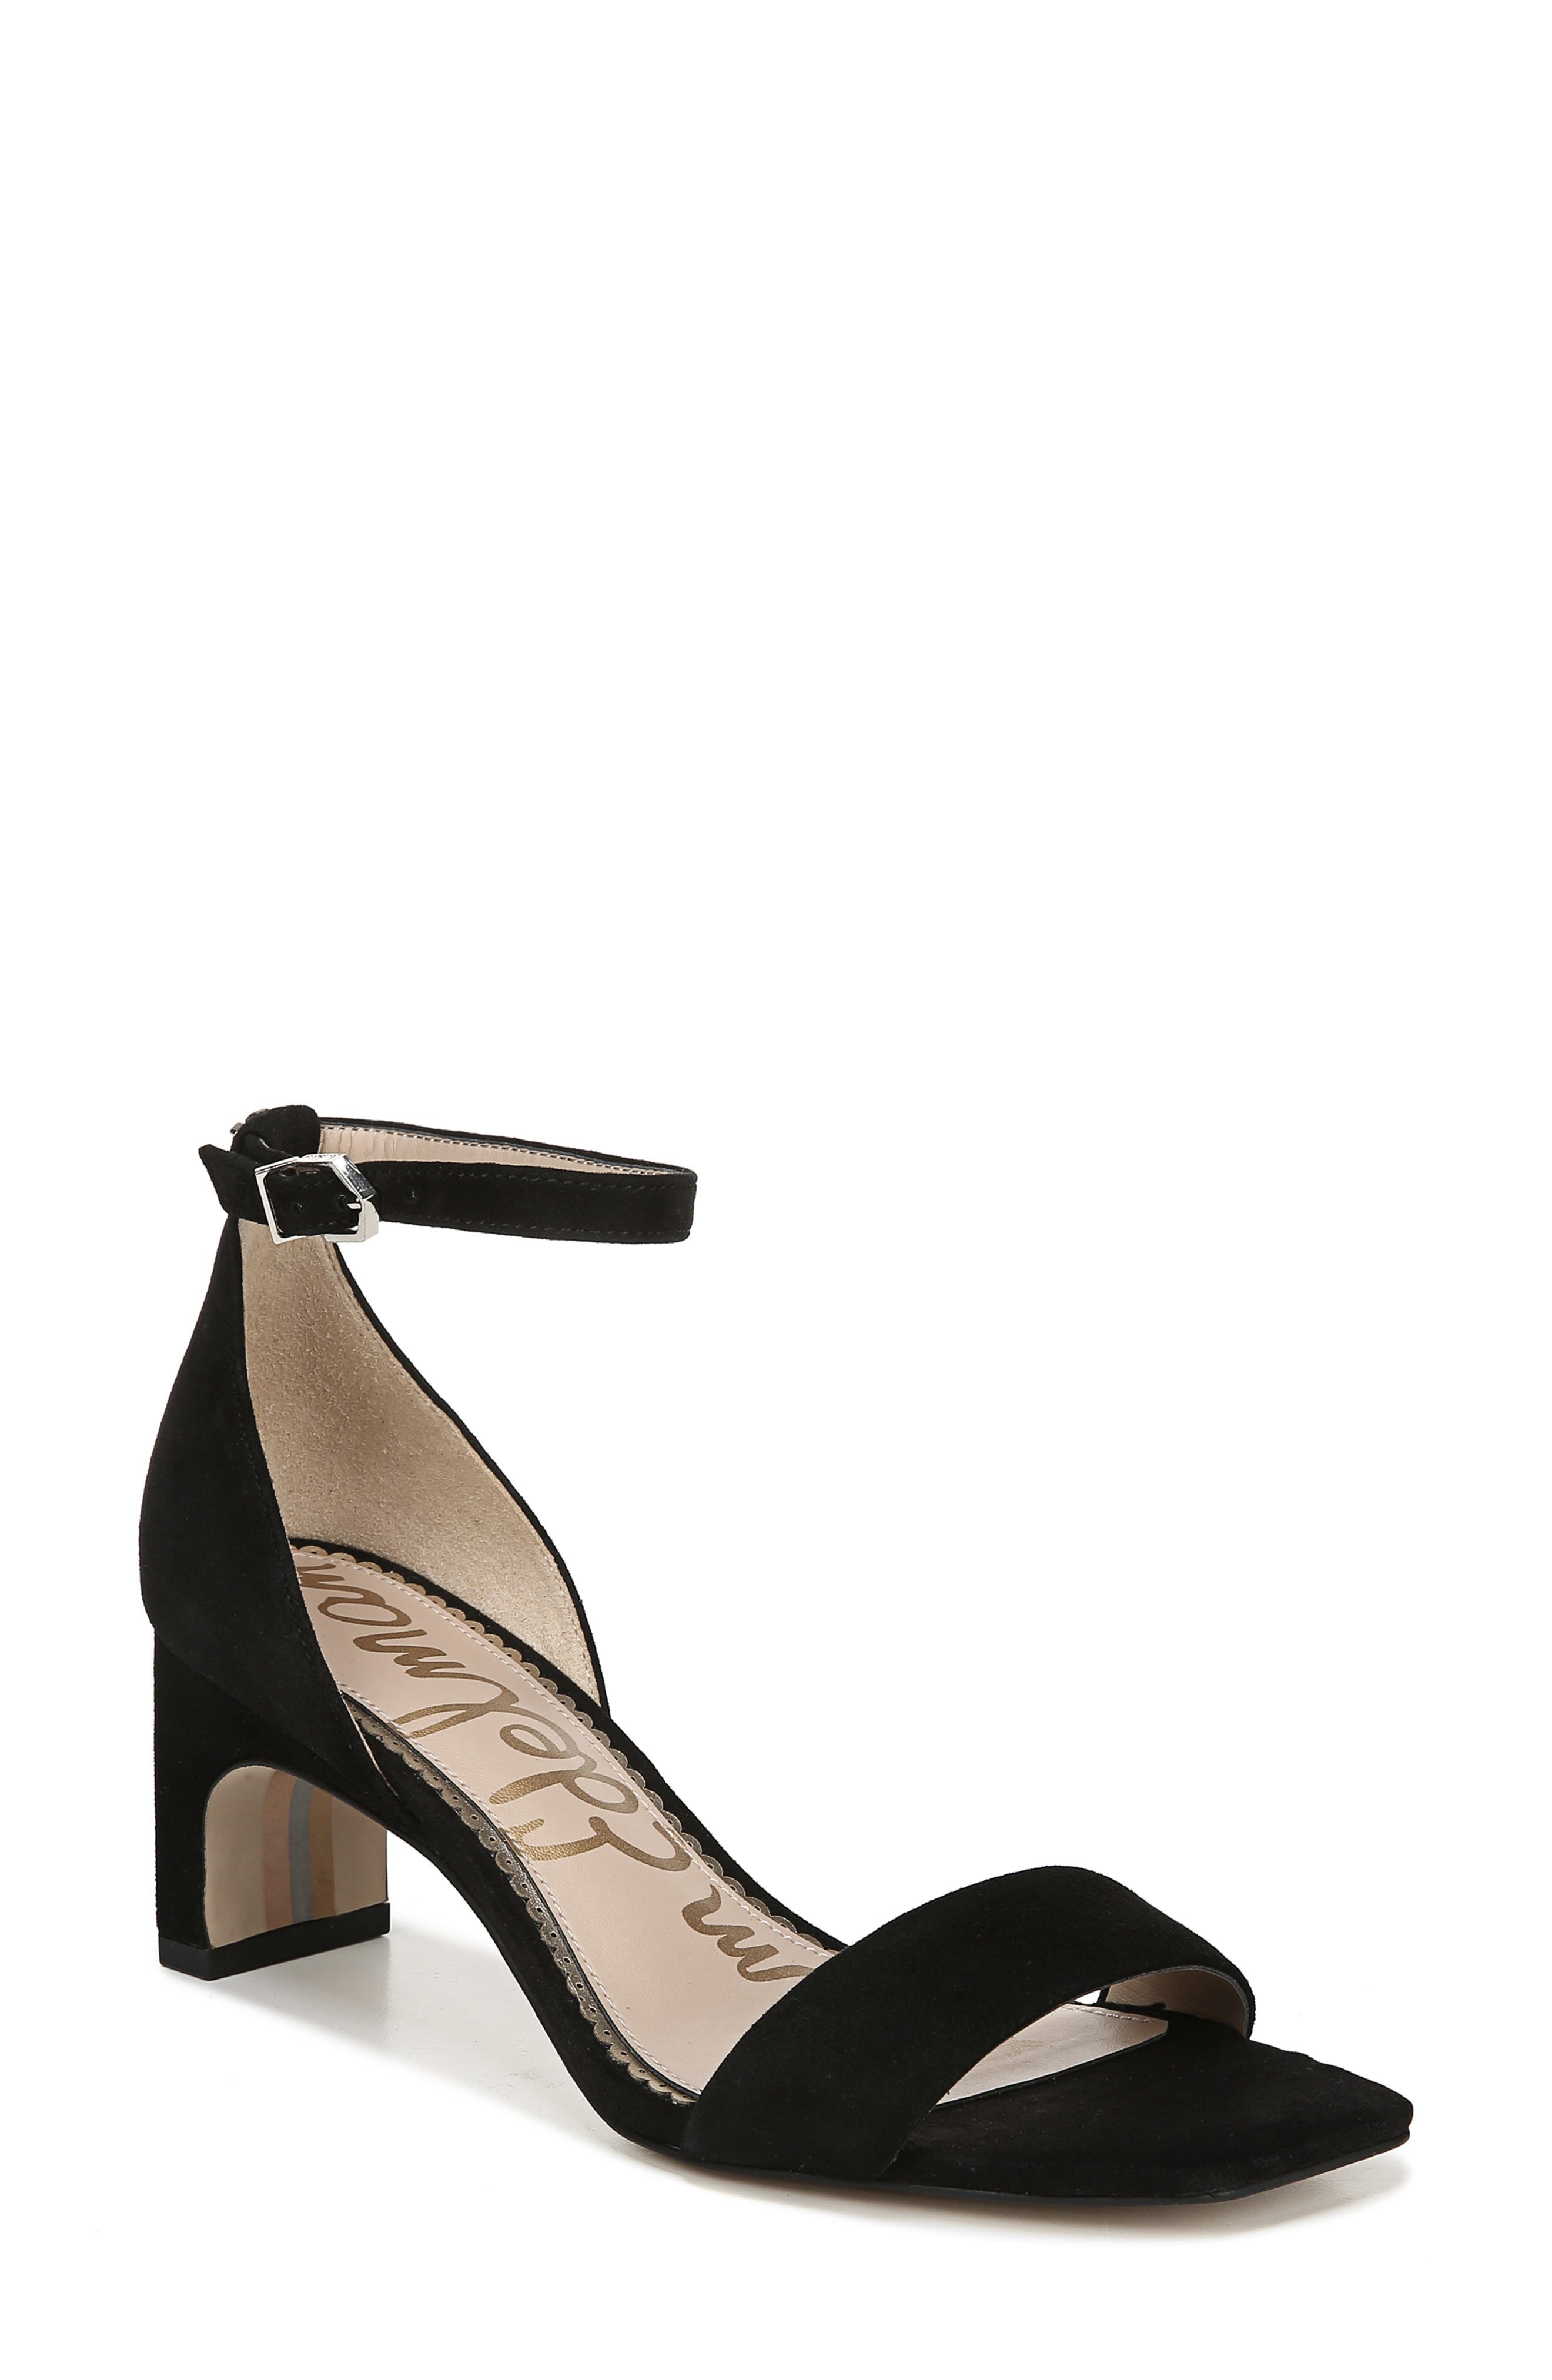 SAM EDELMAN Holmes Ankle Strap Sandal, Main, color, BLACK SUEDE LEATHER